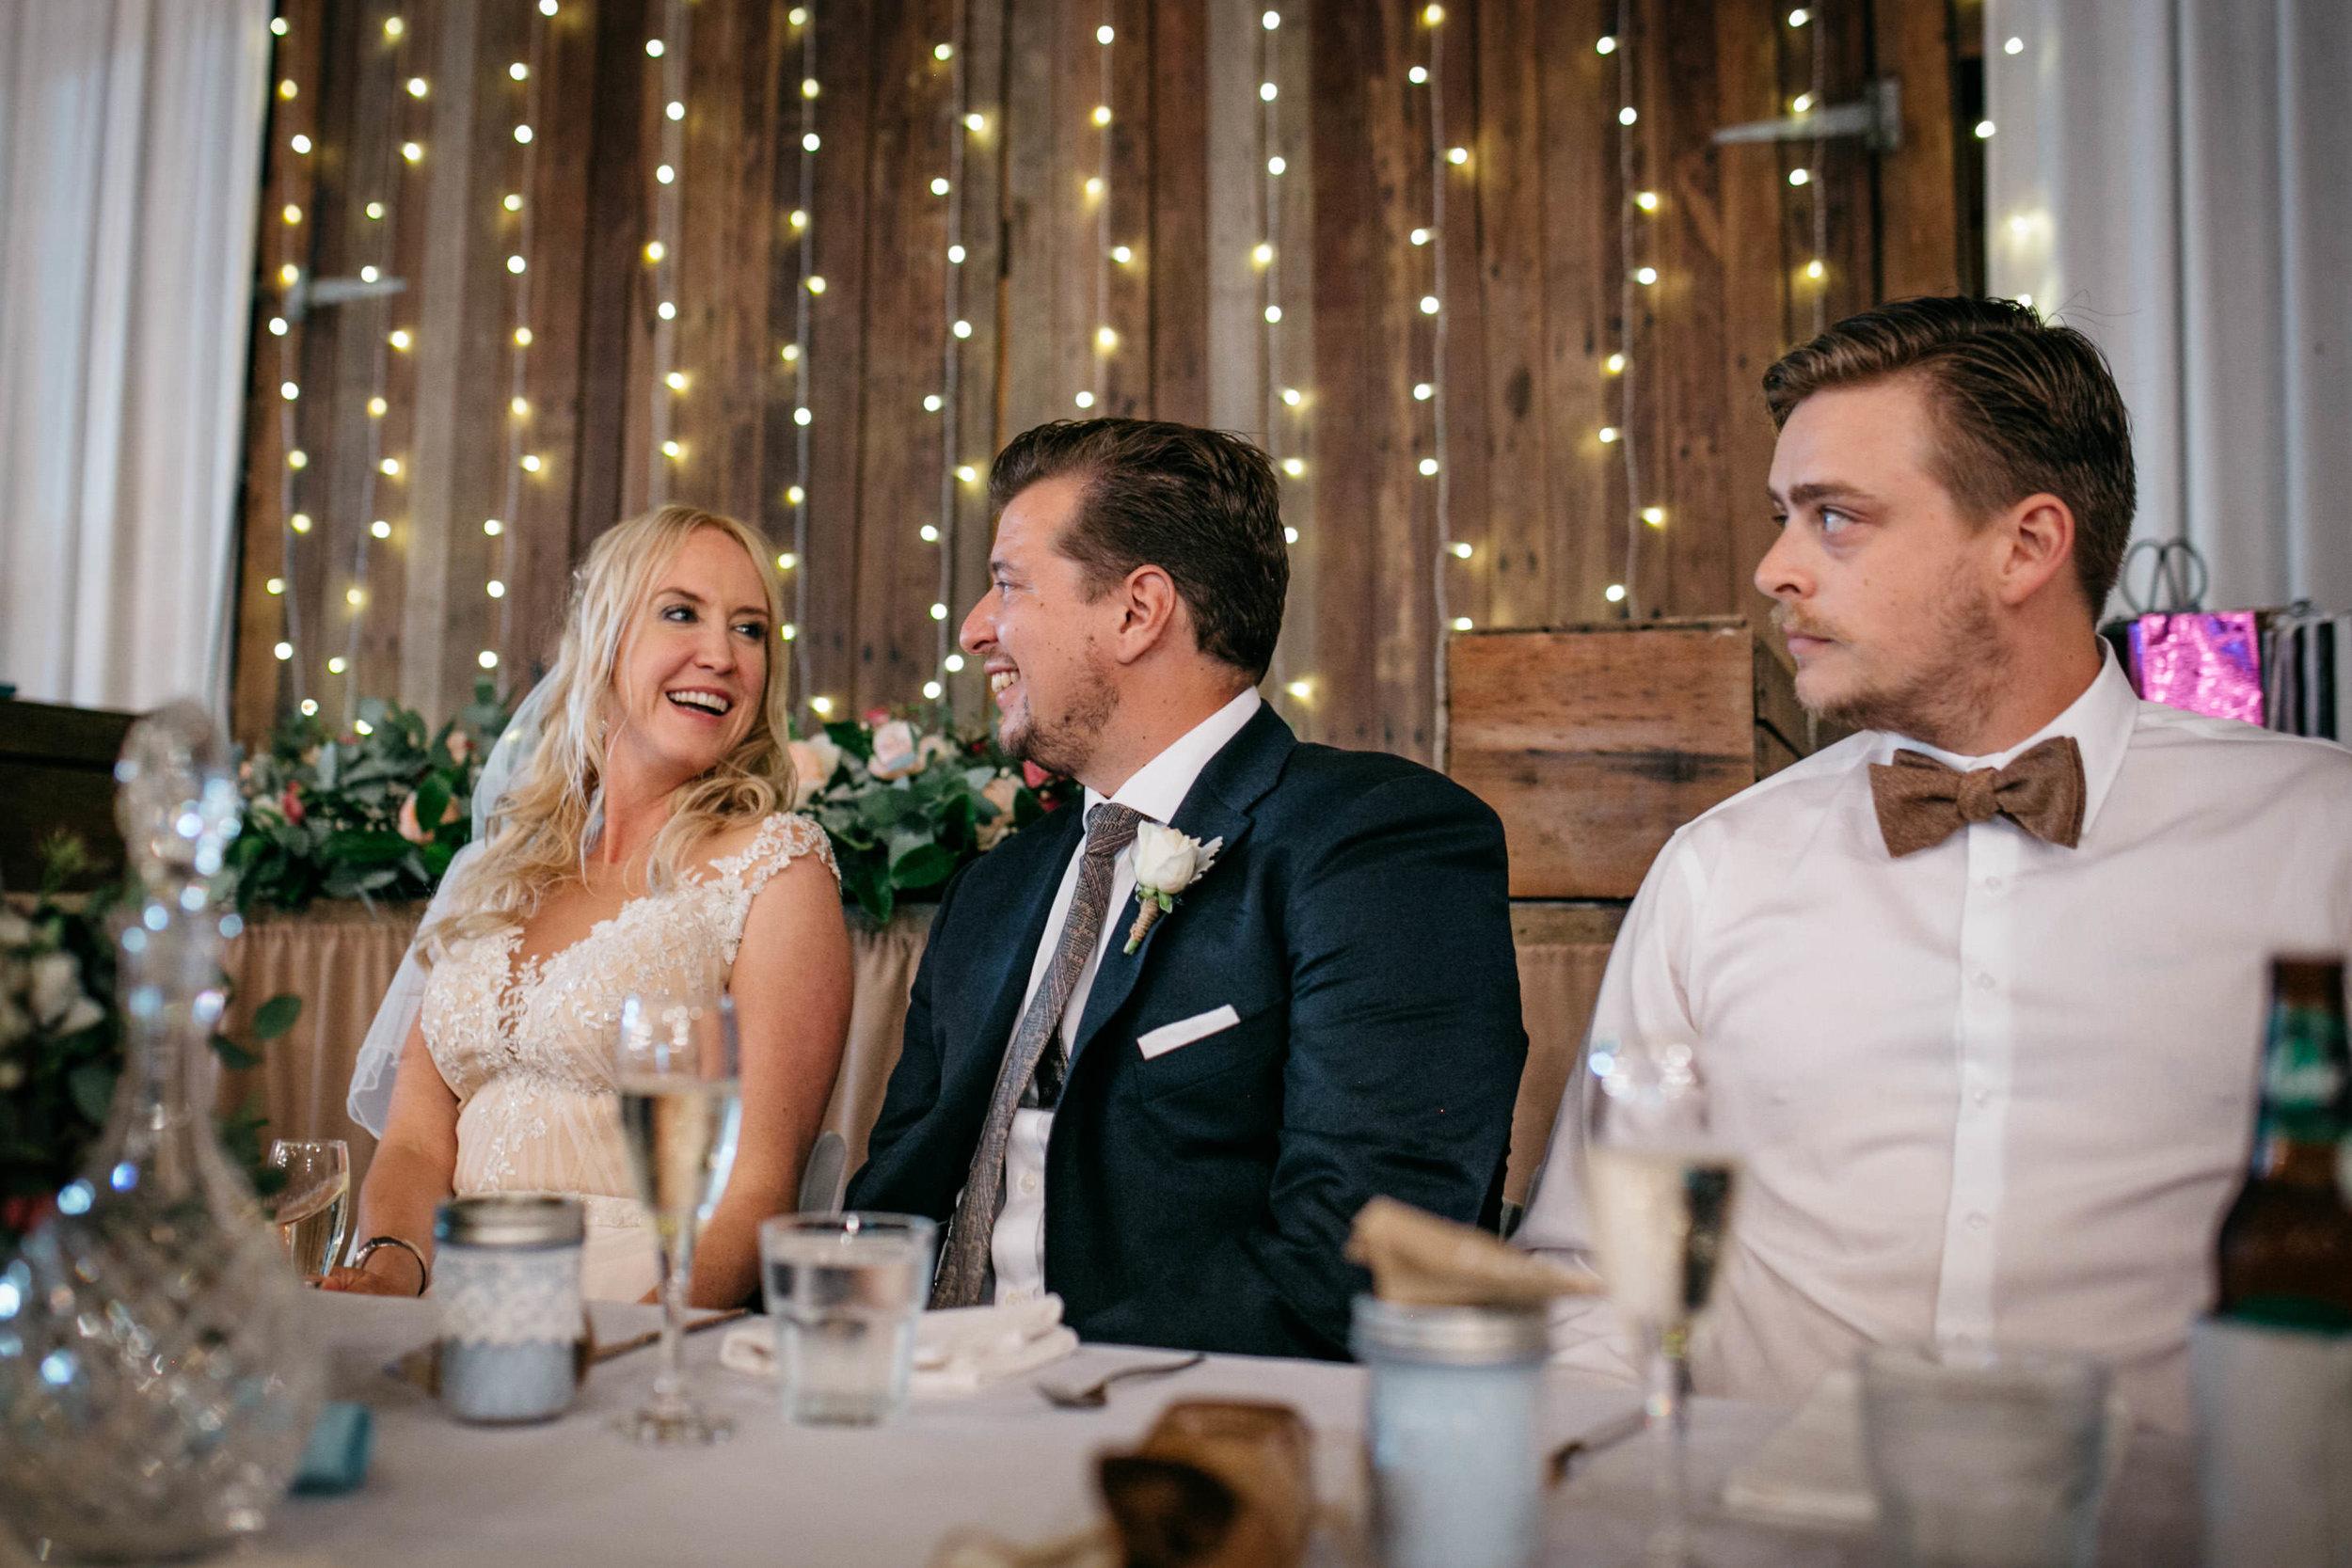 True North Photography_Boomerang Farm_Stacey and Isaac_Gold Coast Wedding_Barm Wedding_Hinterland Wedding-198.jpg